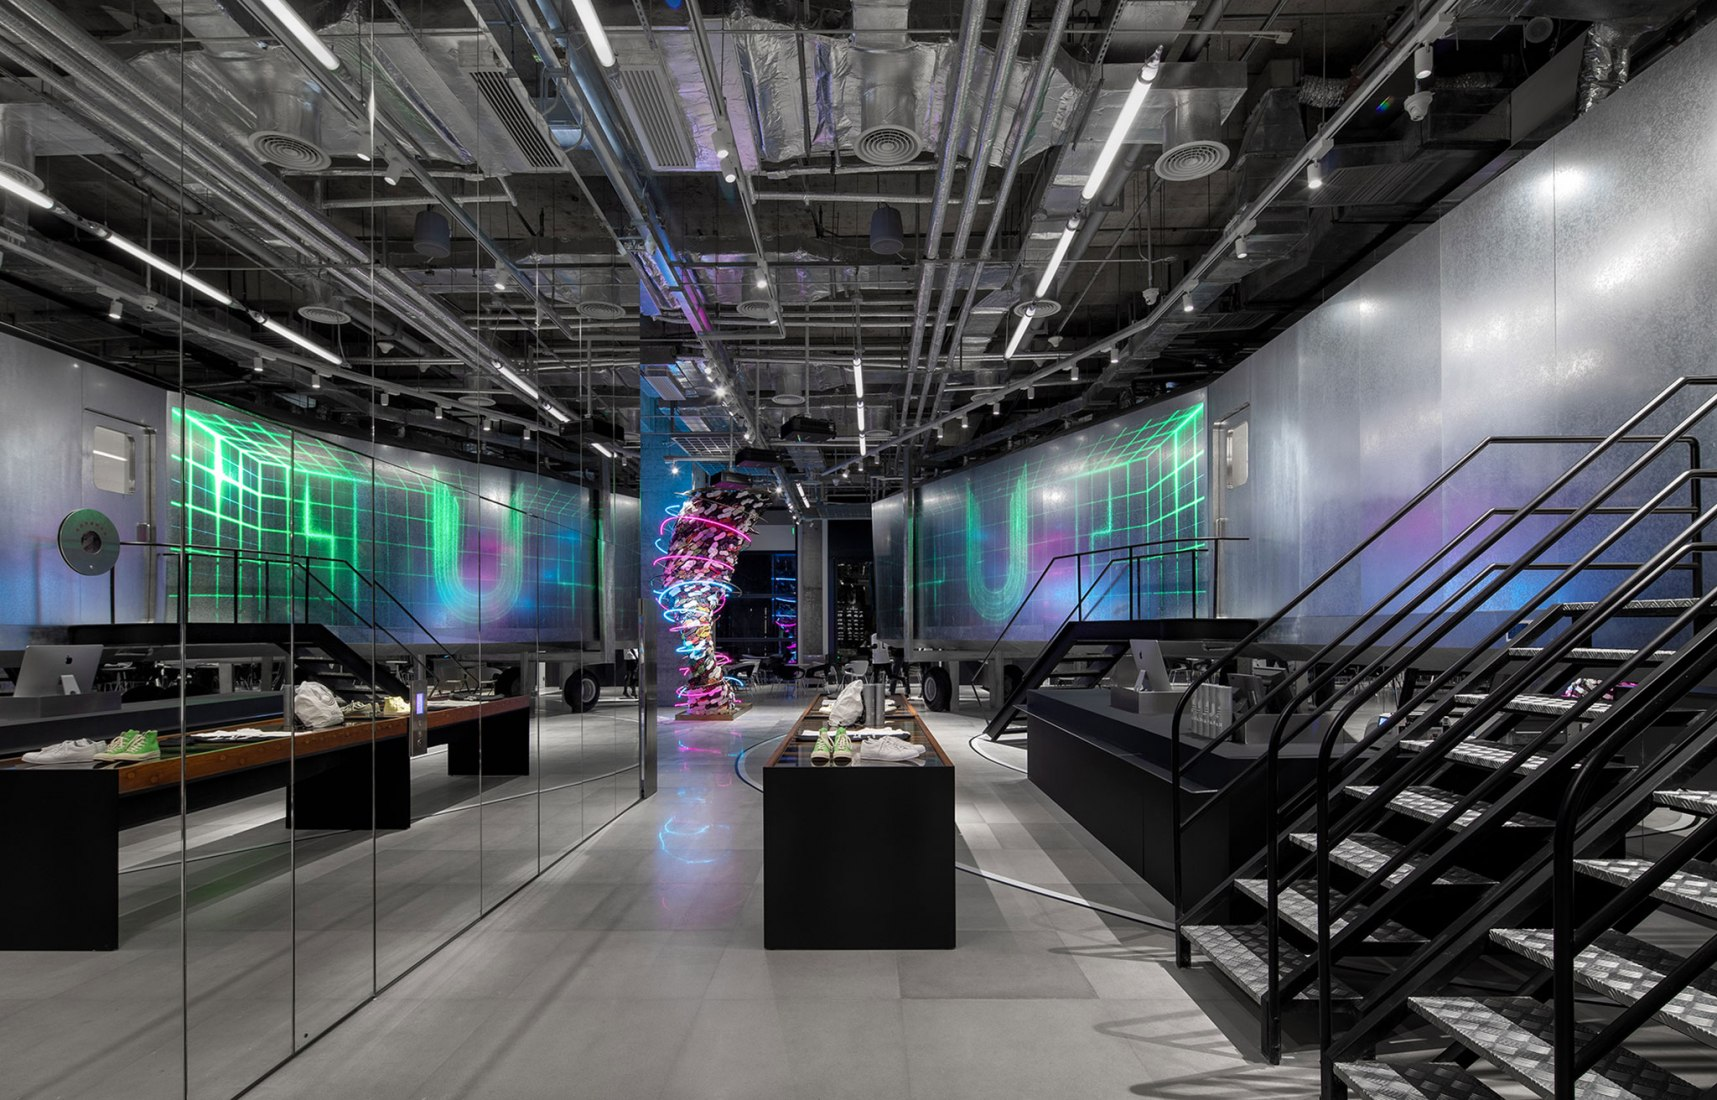 UPAR Flagship Store Lighting Design by GD-Lighting Design. Photograph by Bruce Zheng.